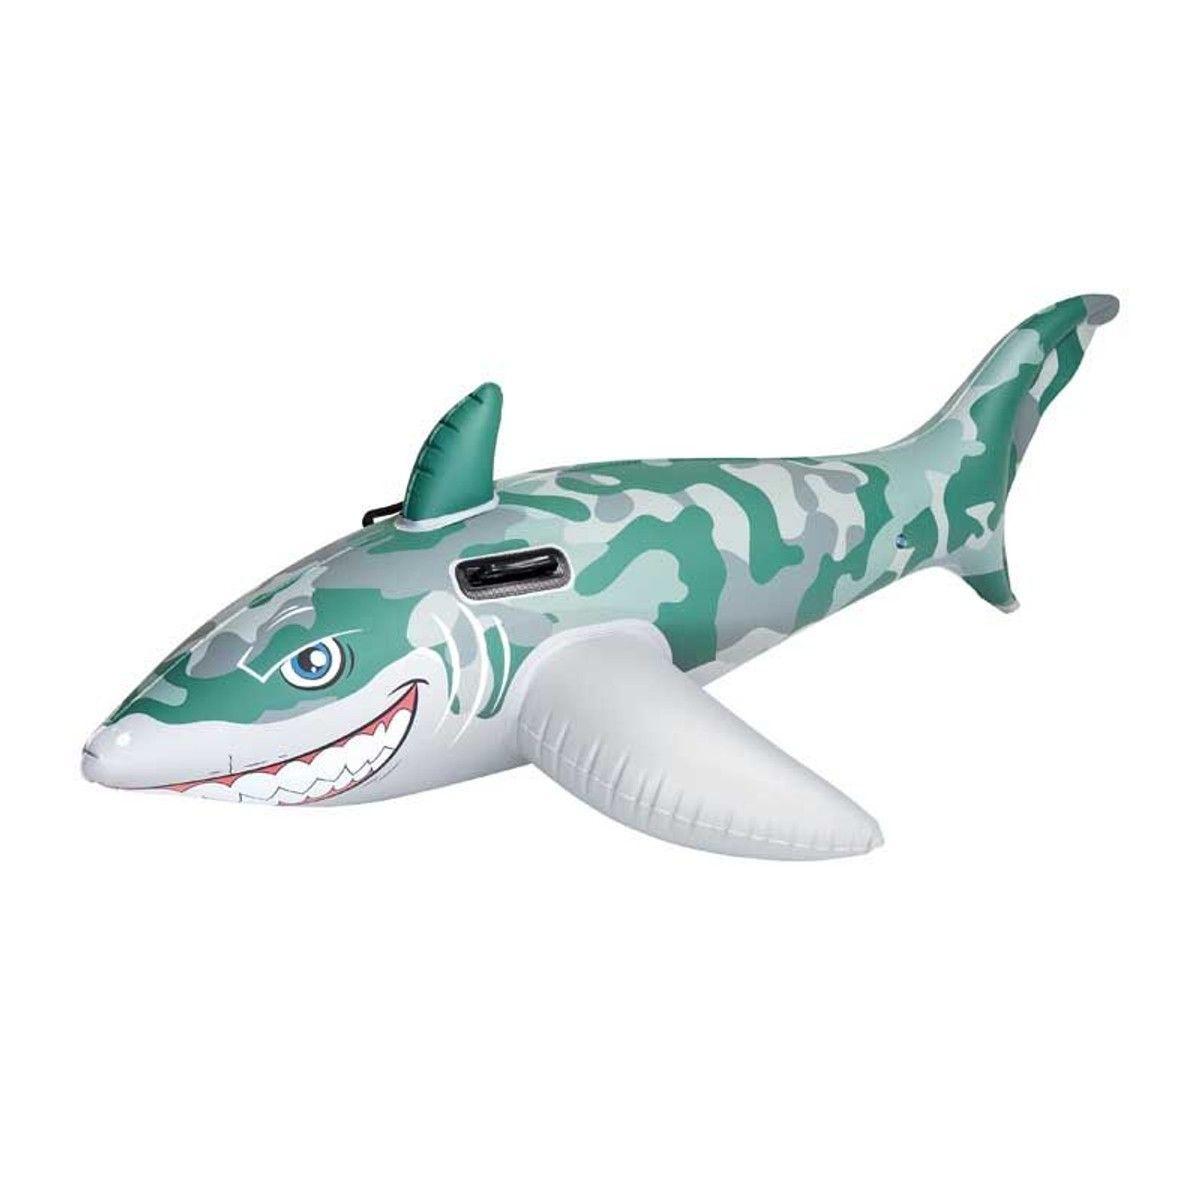 Chevaucha Requin Armee 183x102 Piscine Gonflable Jouets